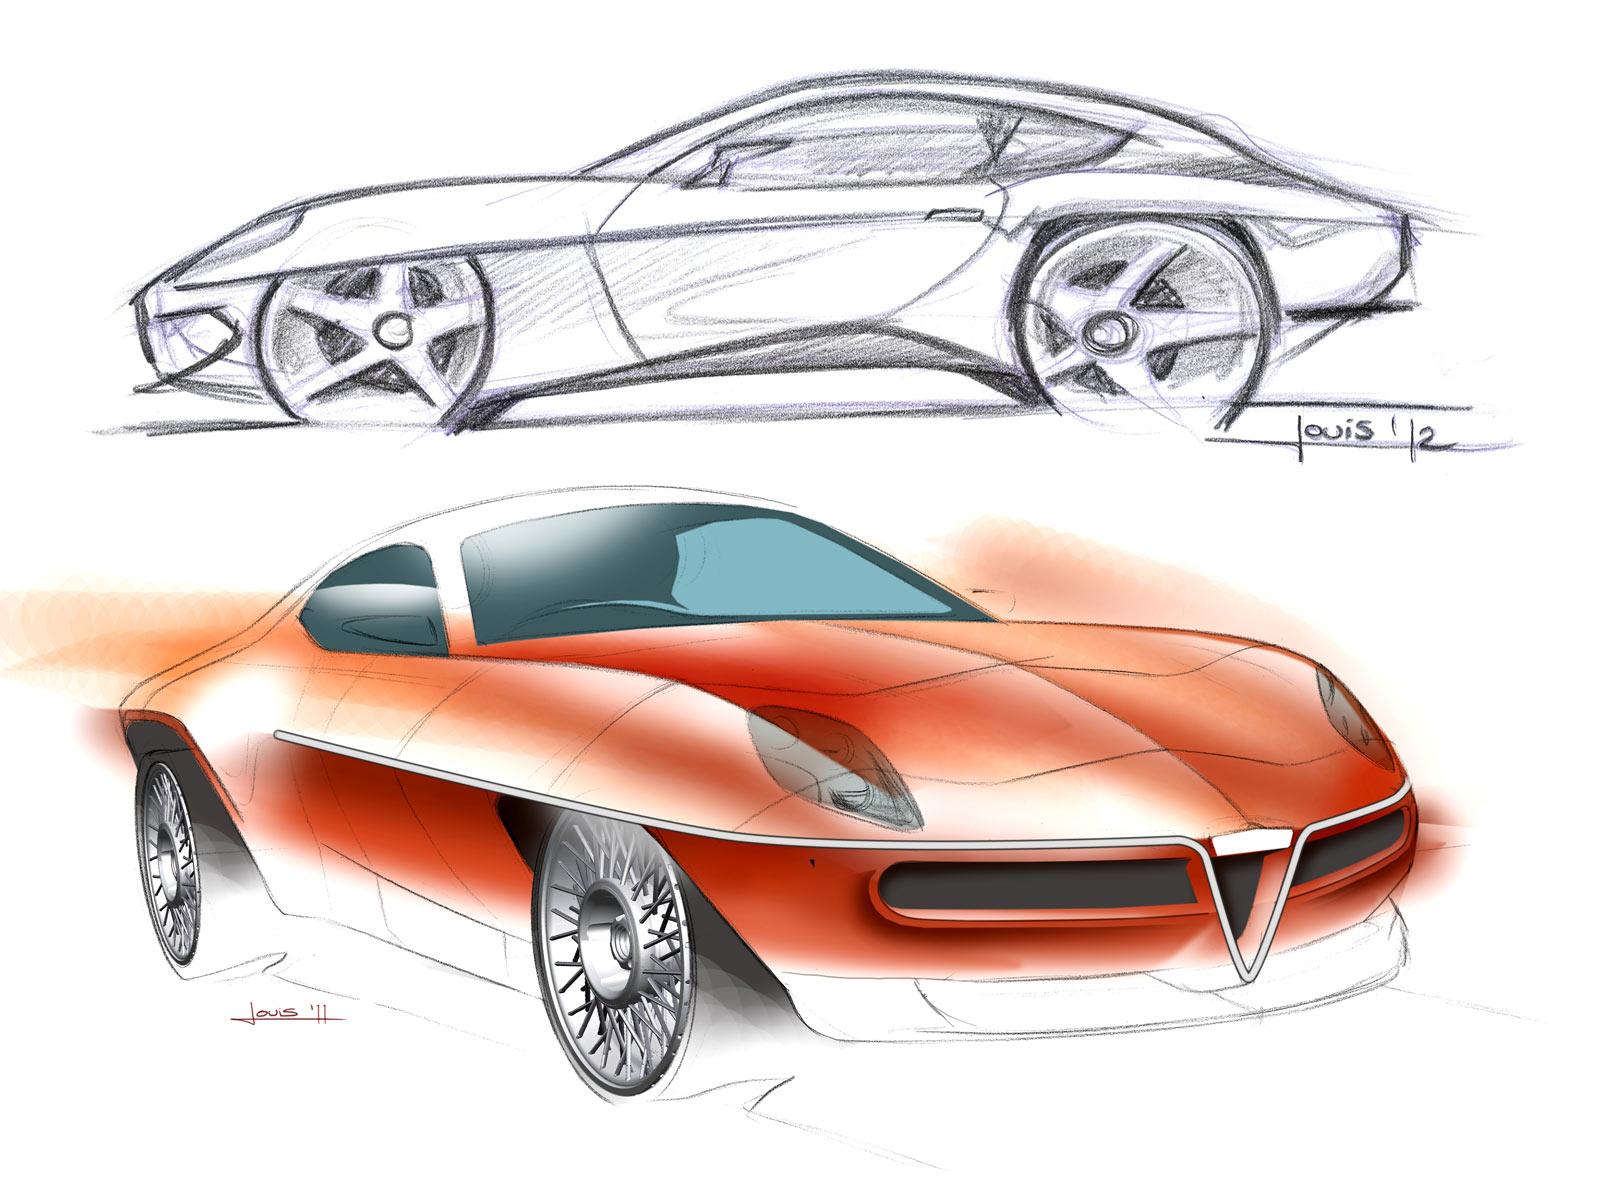 2012_Touring_Superleggera_Disco_Volante_Concept_Design-Sketch_01